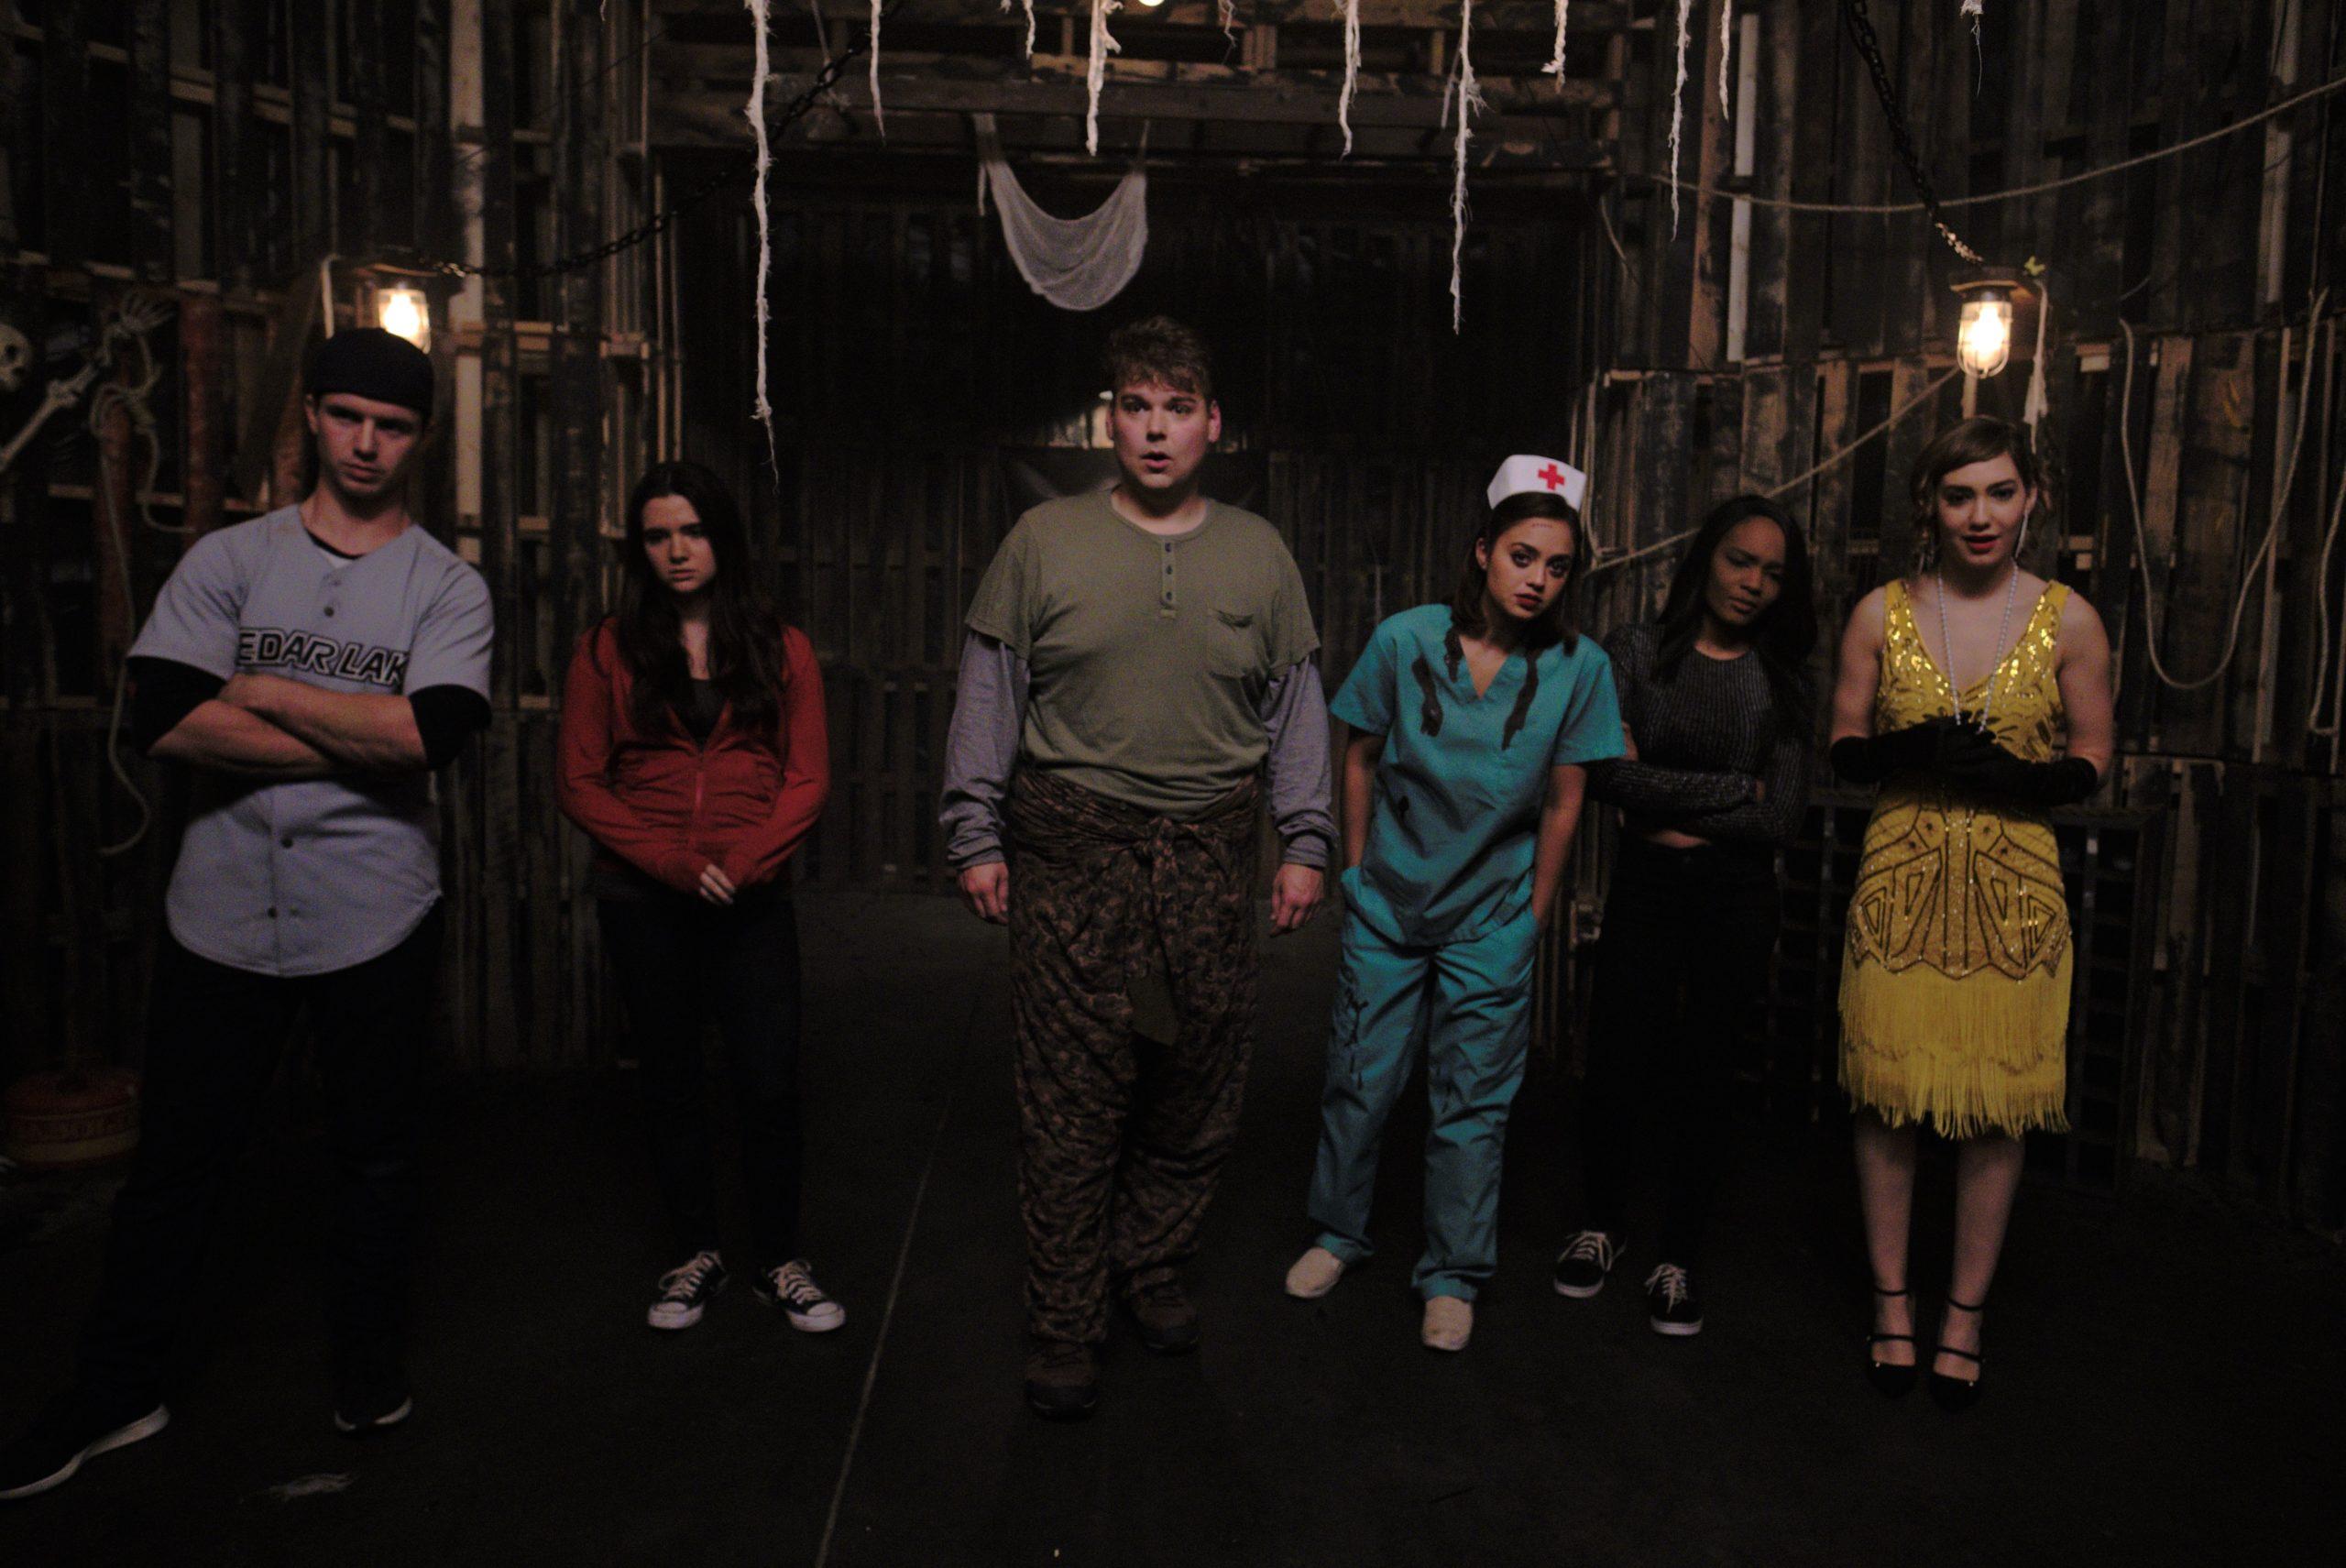 zombiefilme 2019